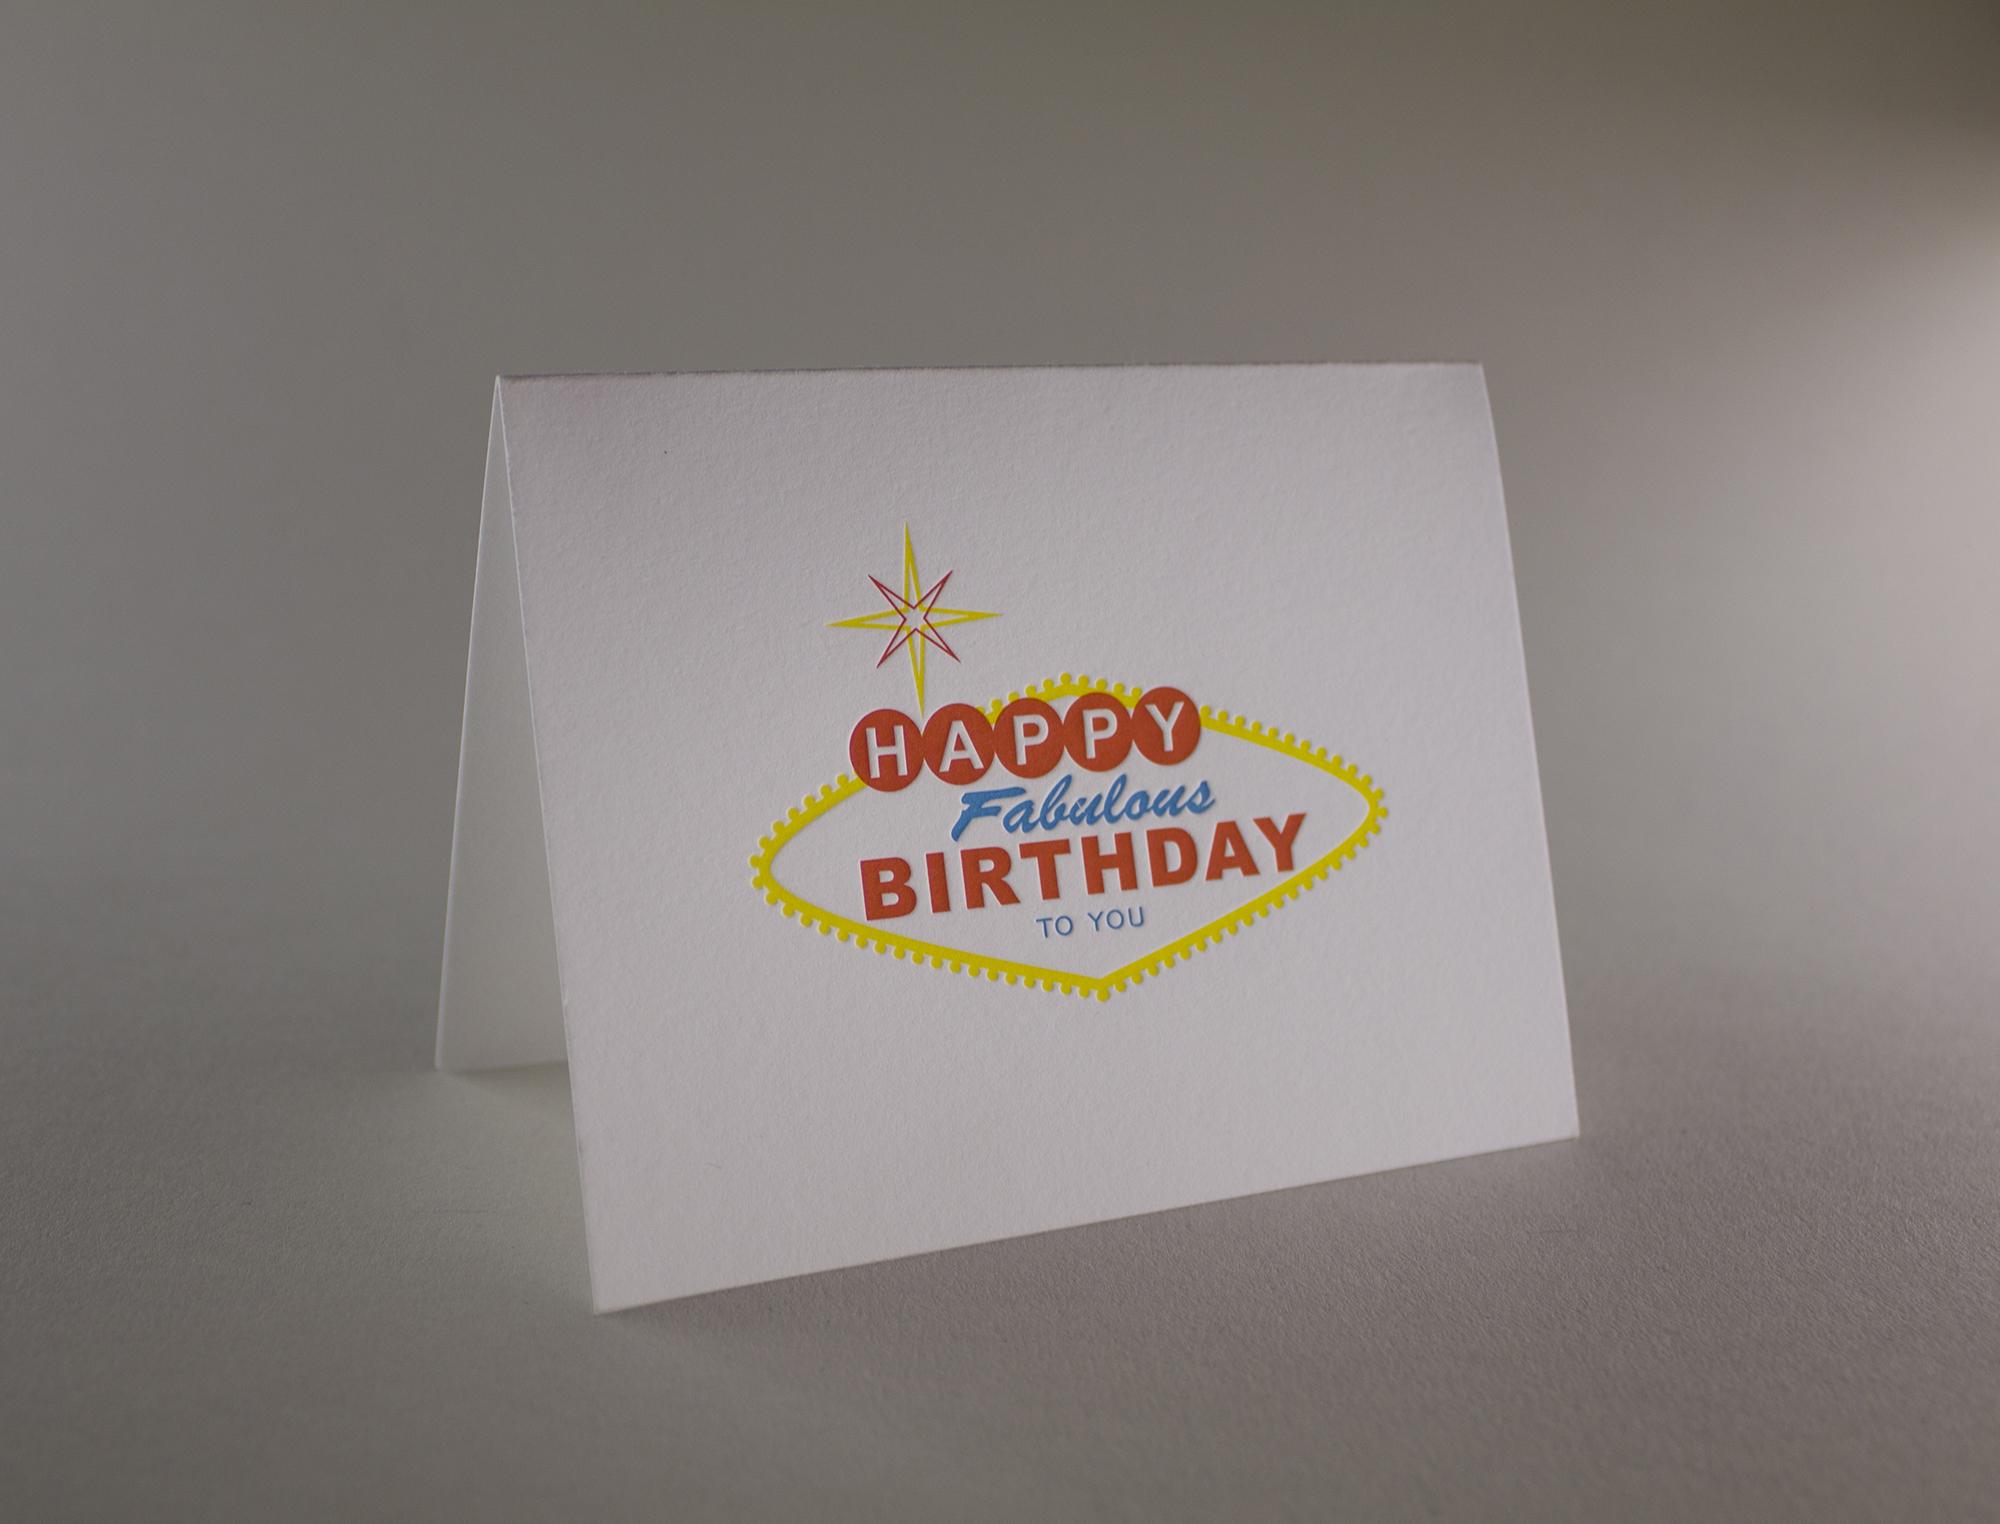 vegas birthday letterpress greeting card - Letterpress Greeting Cards